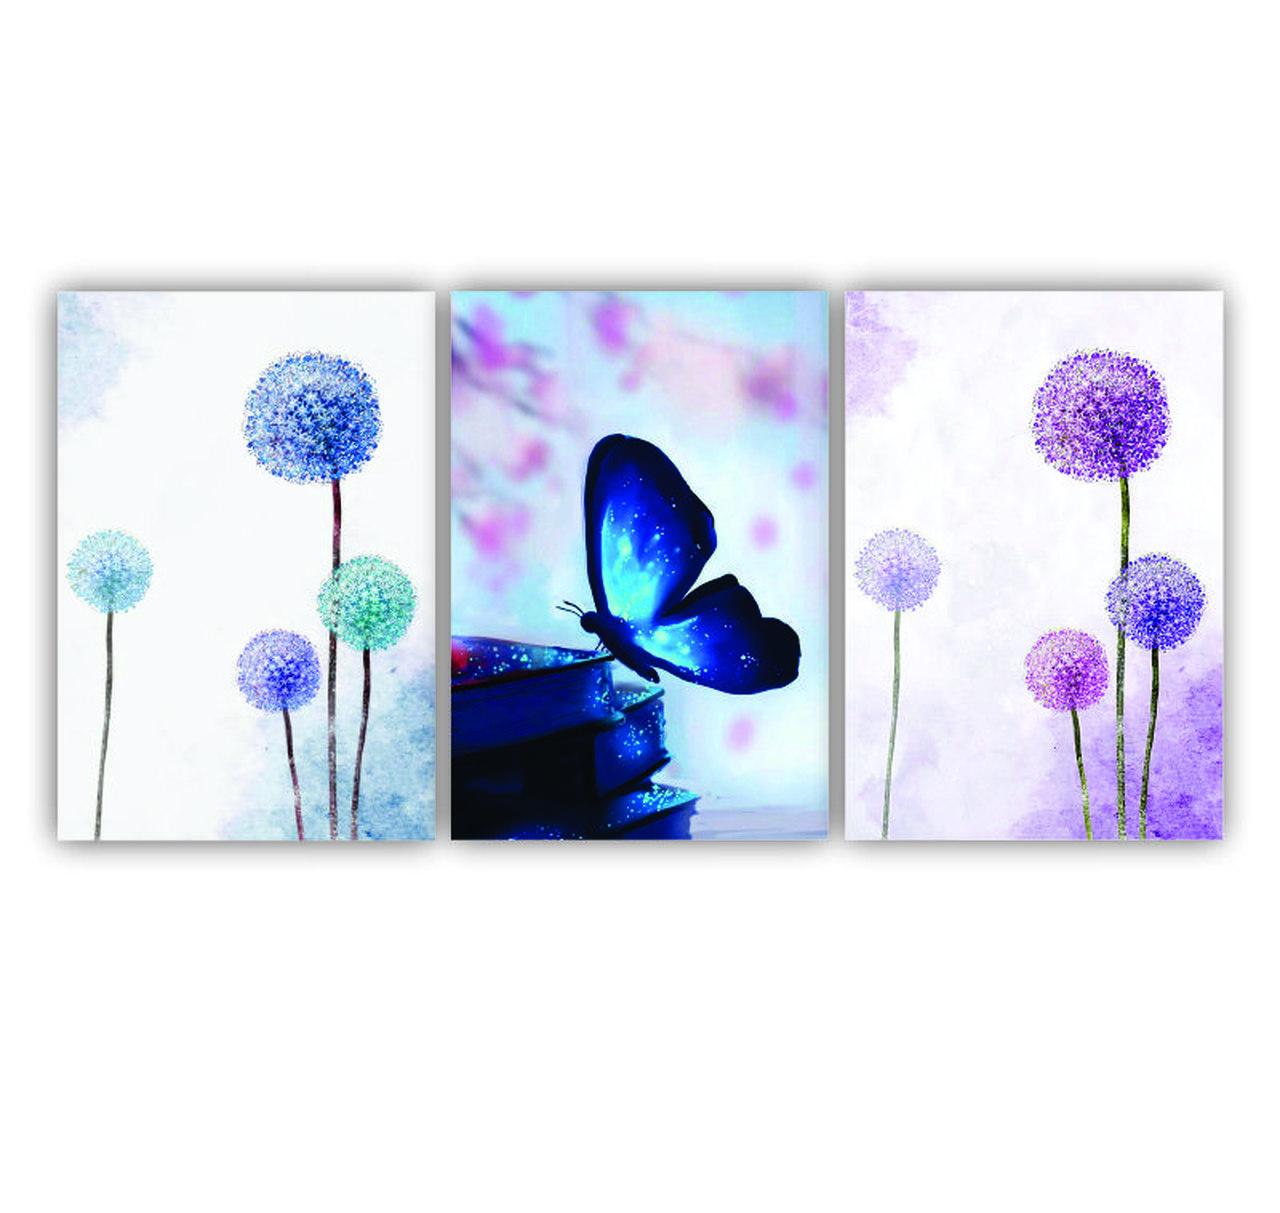 Quadro Flor e Borboletas Azul e Lilás Delicado - Kit 3 telas